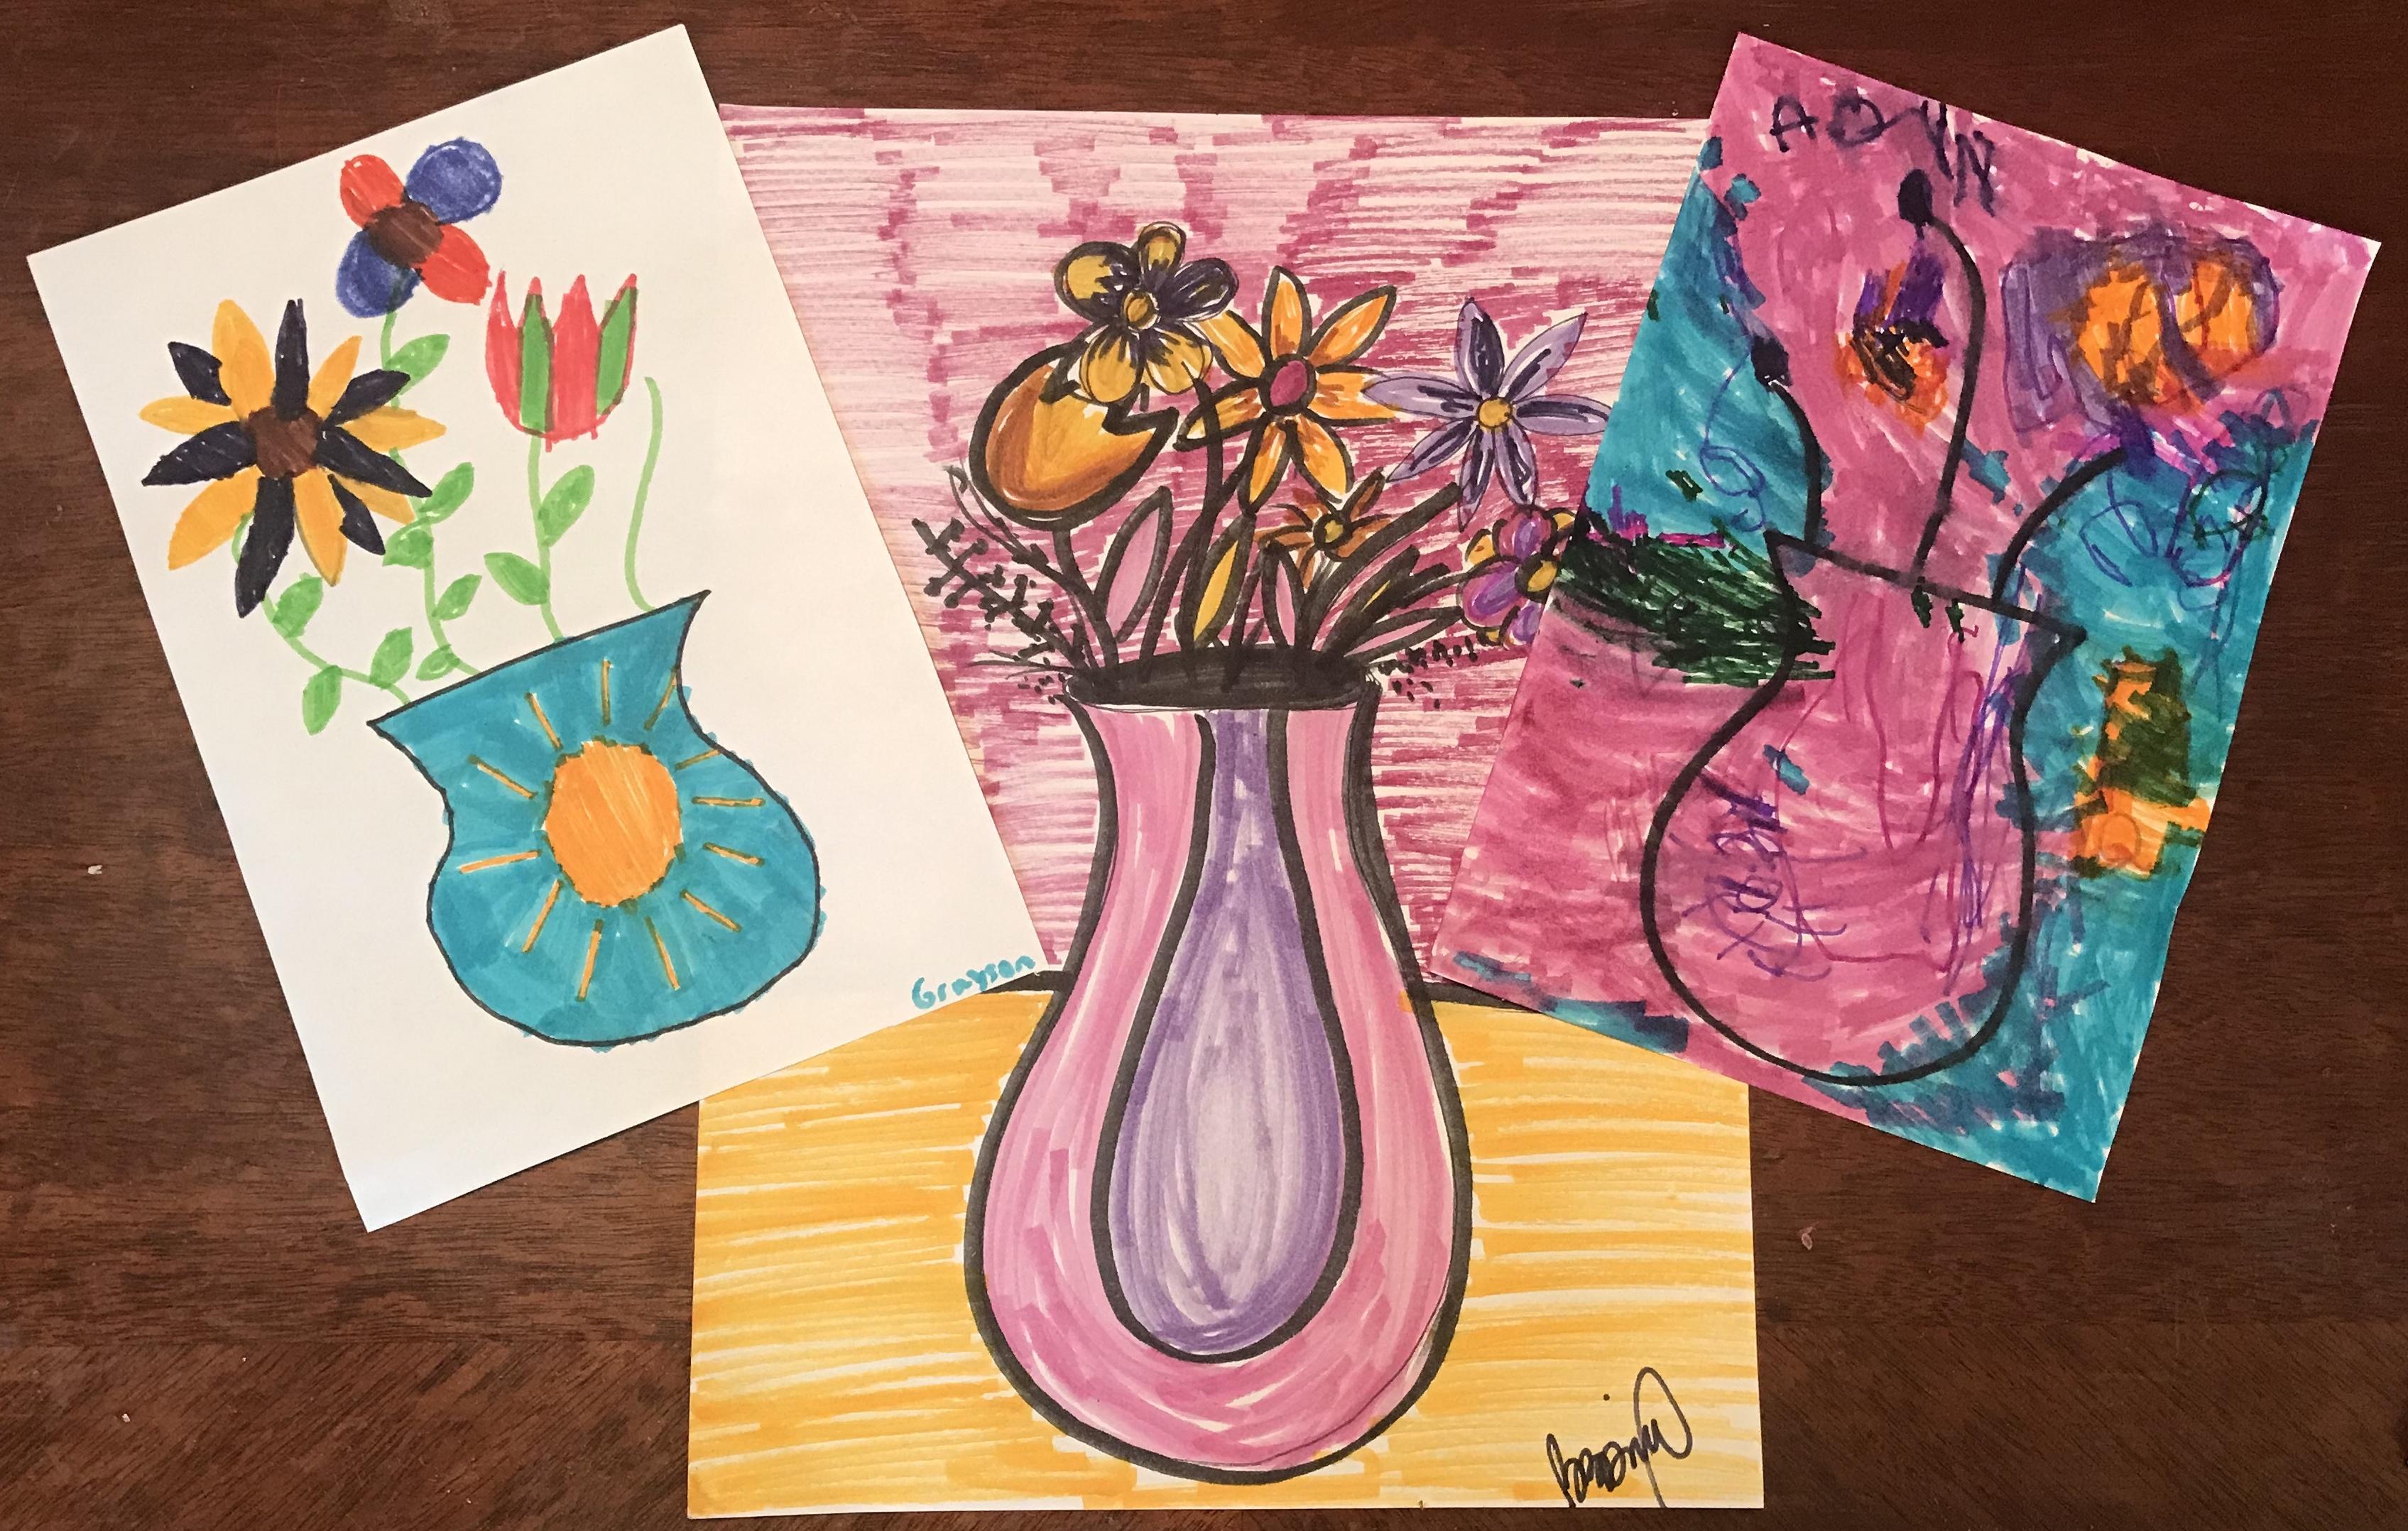 va Gogh Flowers